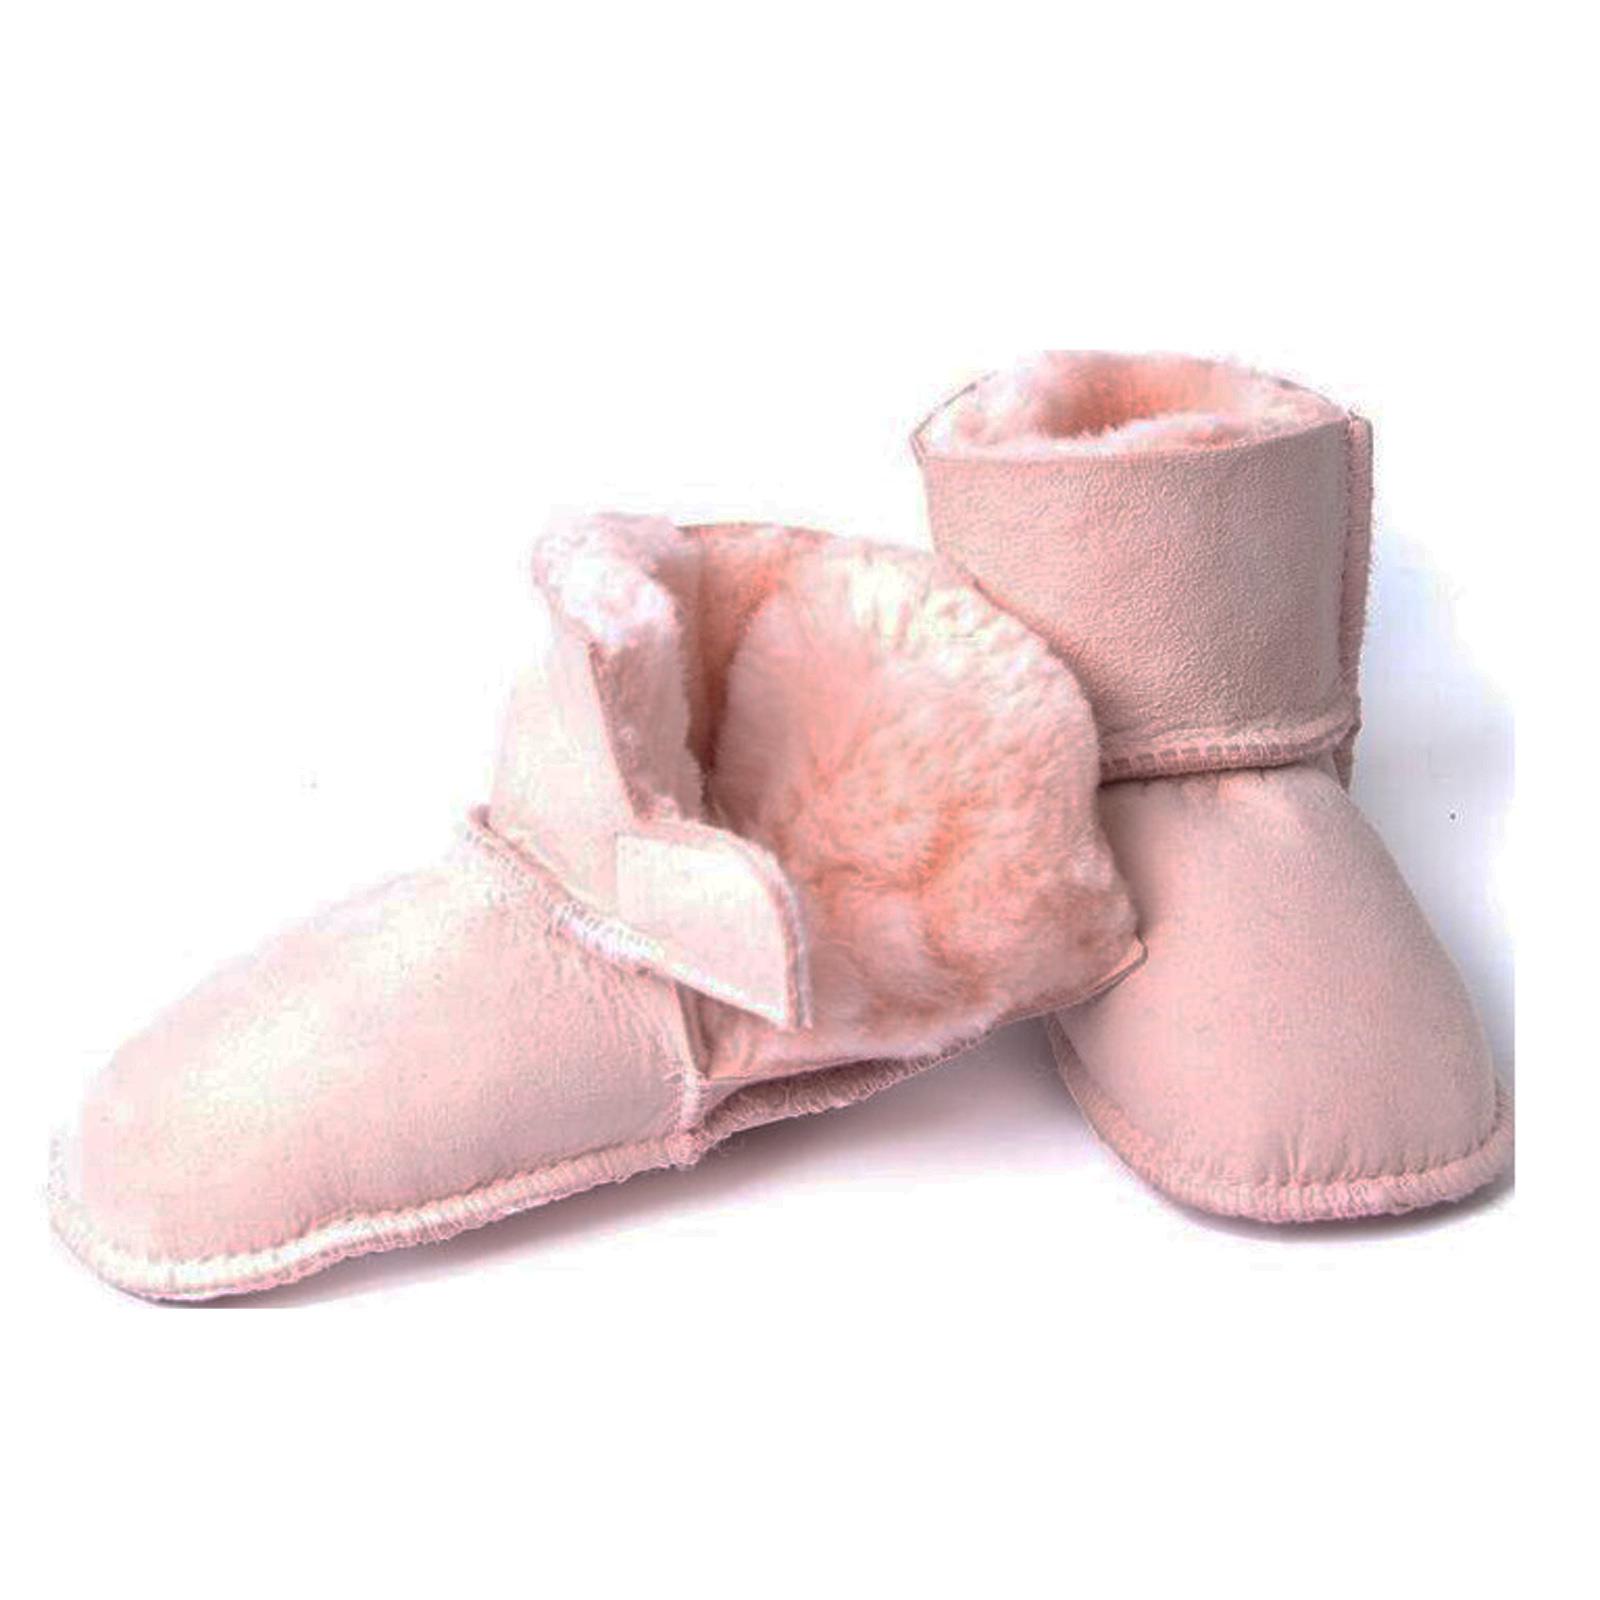 758320c56 Baby Erin Infant Boy Girl Kids 100 Australian Sheepskin Ever UGG ...